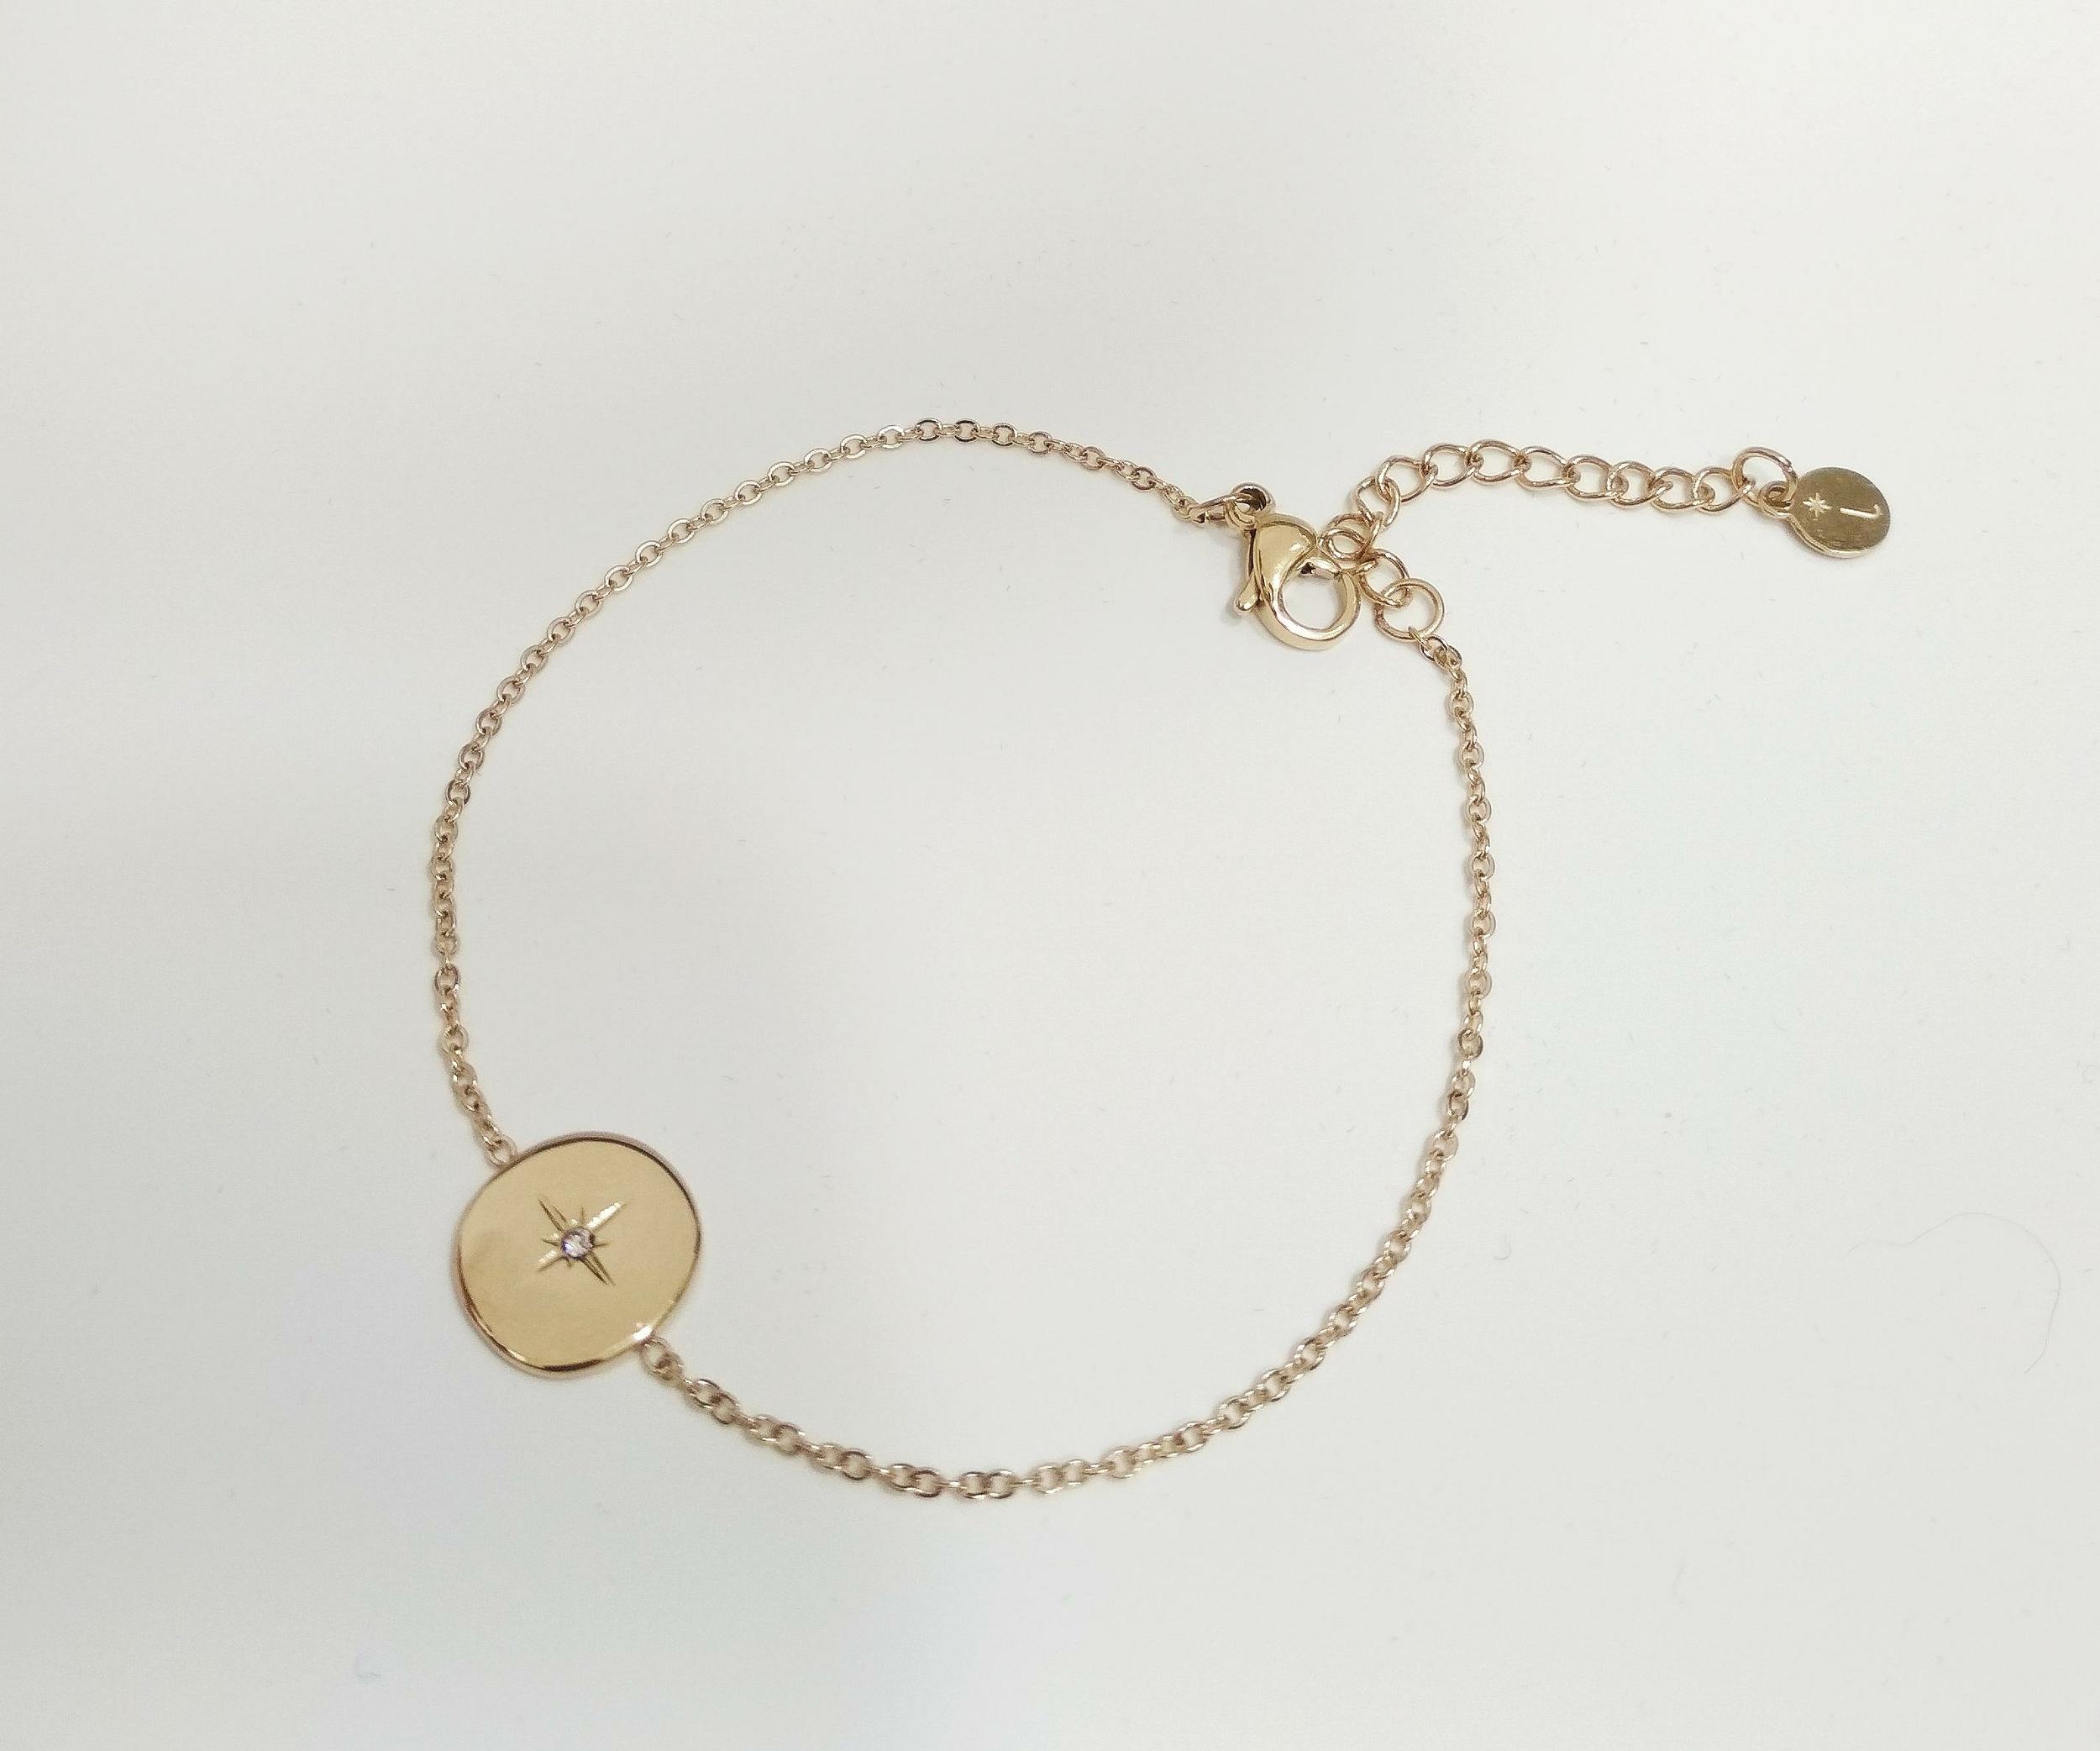 Bracelet chaîne avec étoile strass